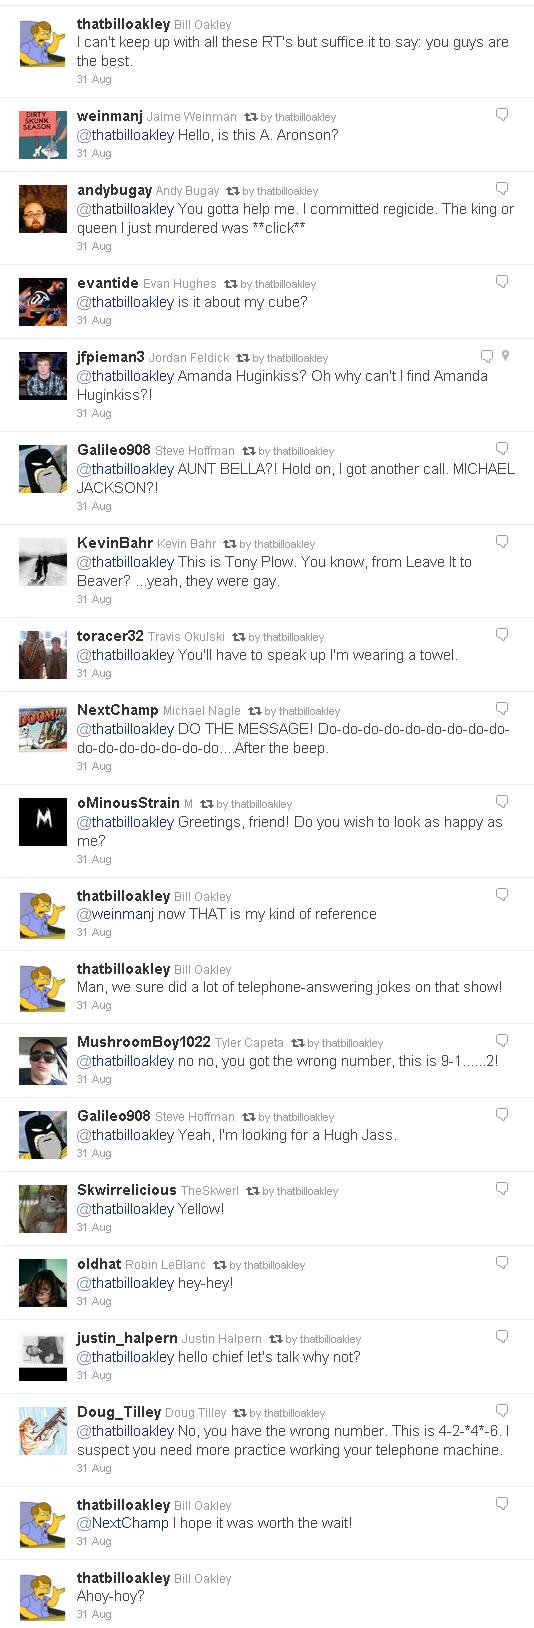 Oakley Tweet - Response